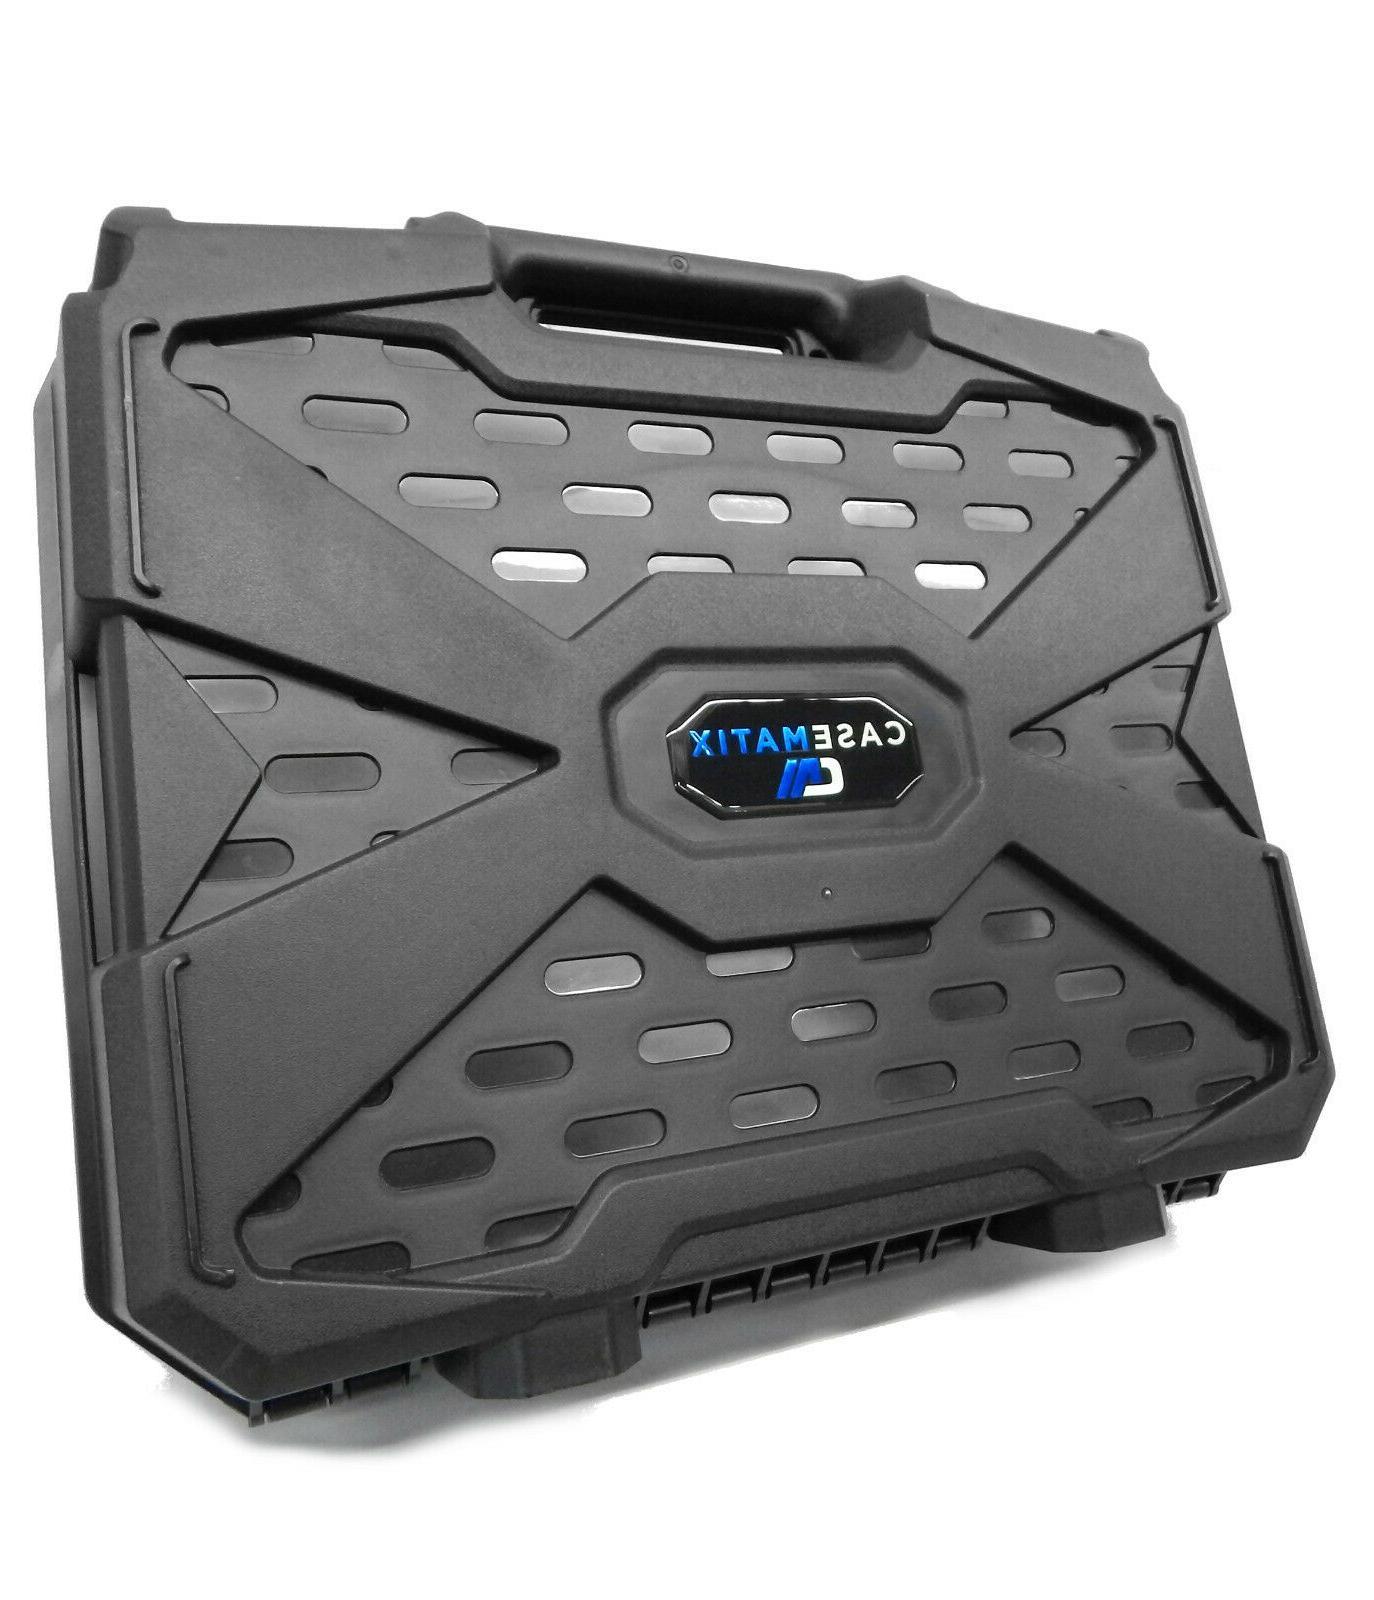 HairStylist Case fits Ionic Hair Dryer Elchim 3900 , Pibbs a